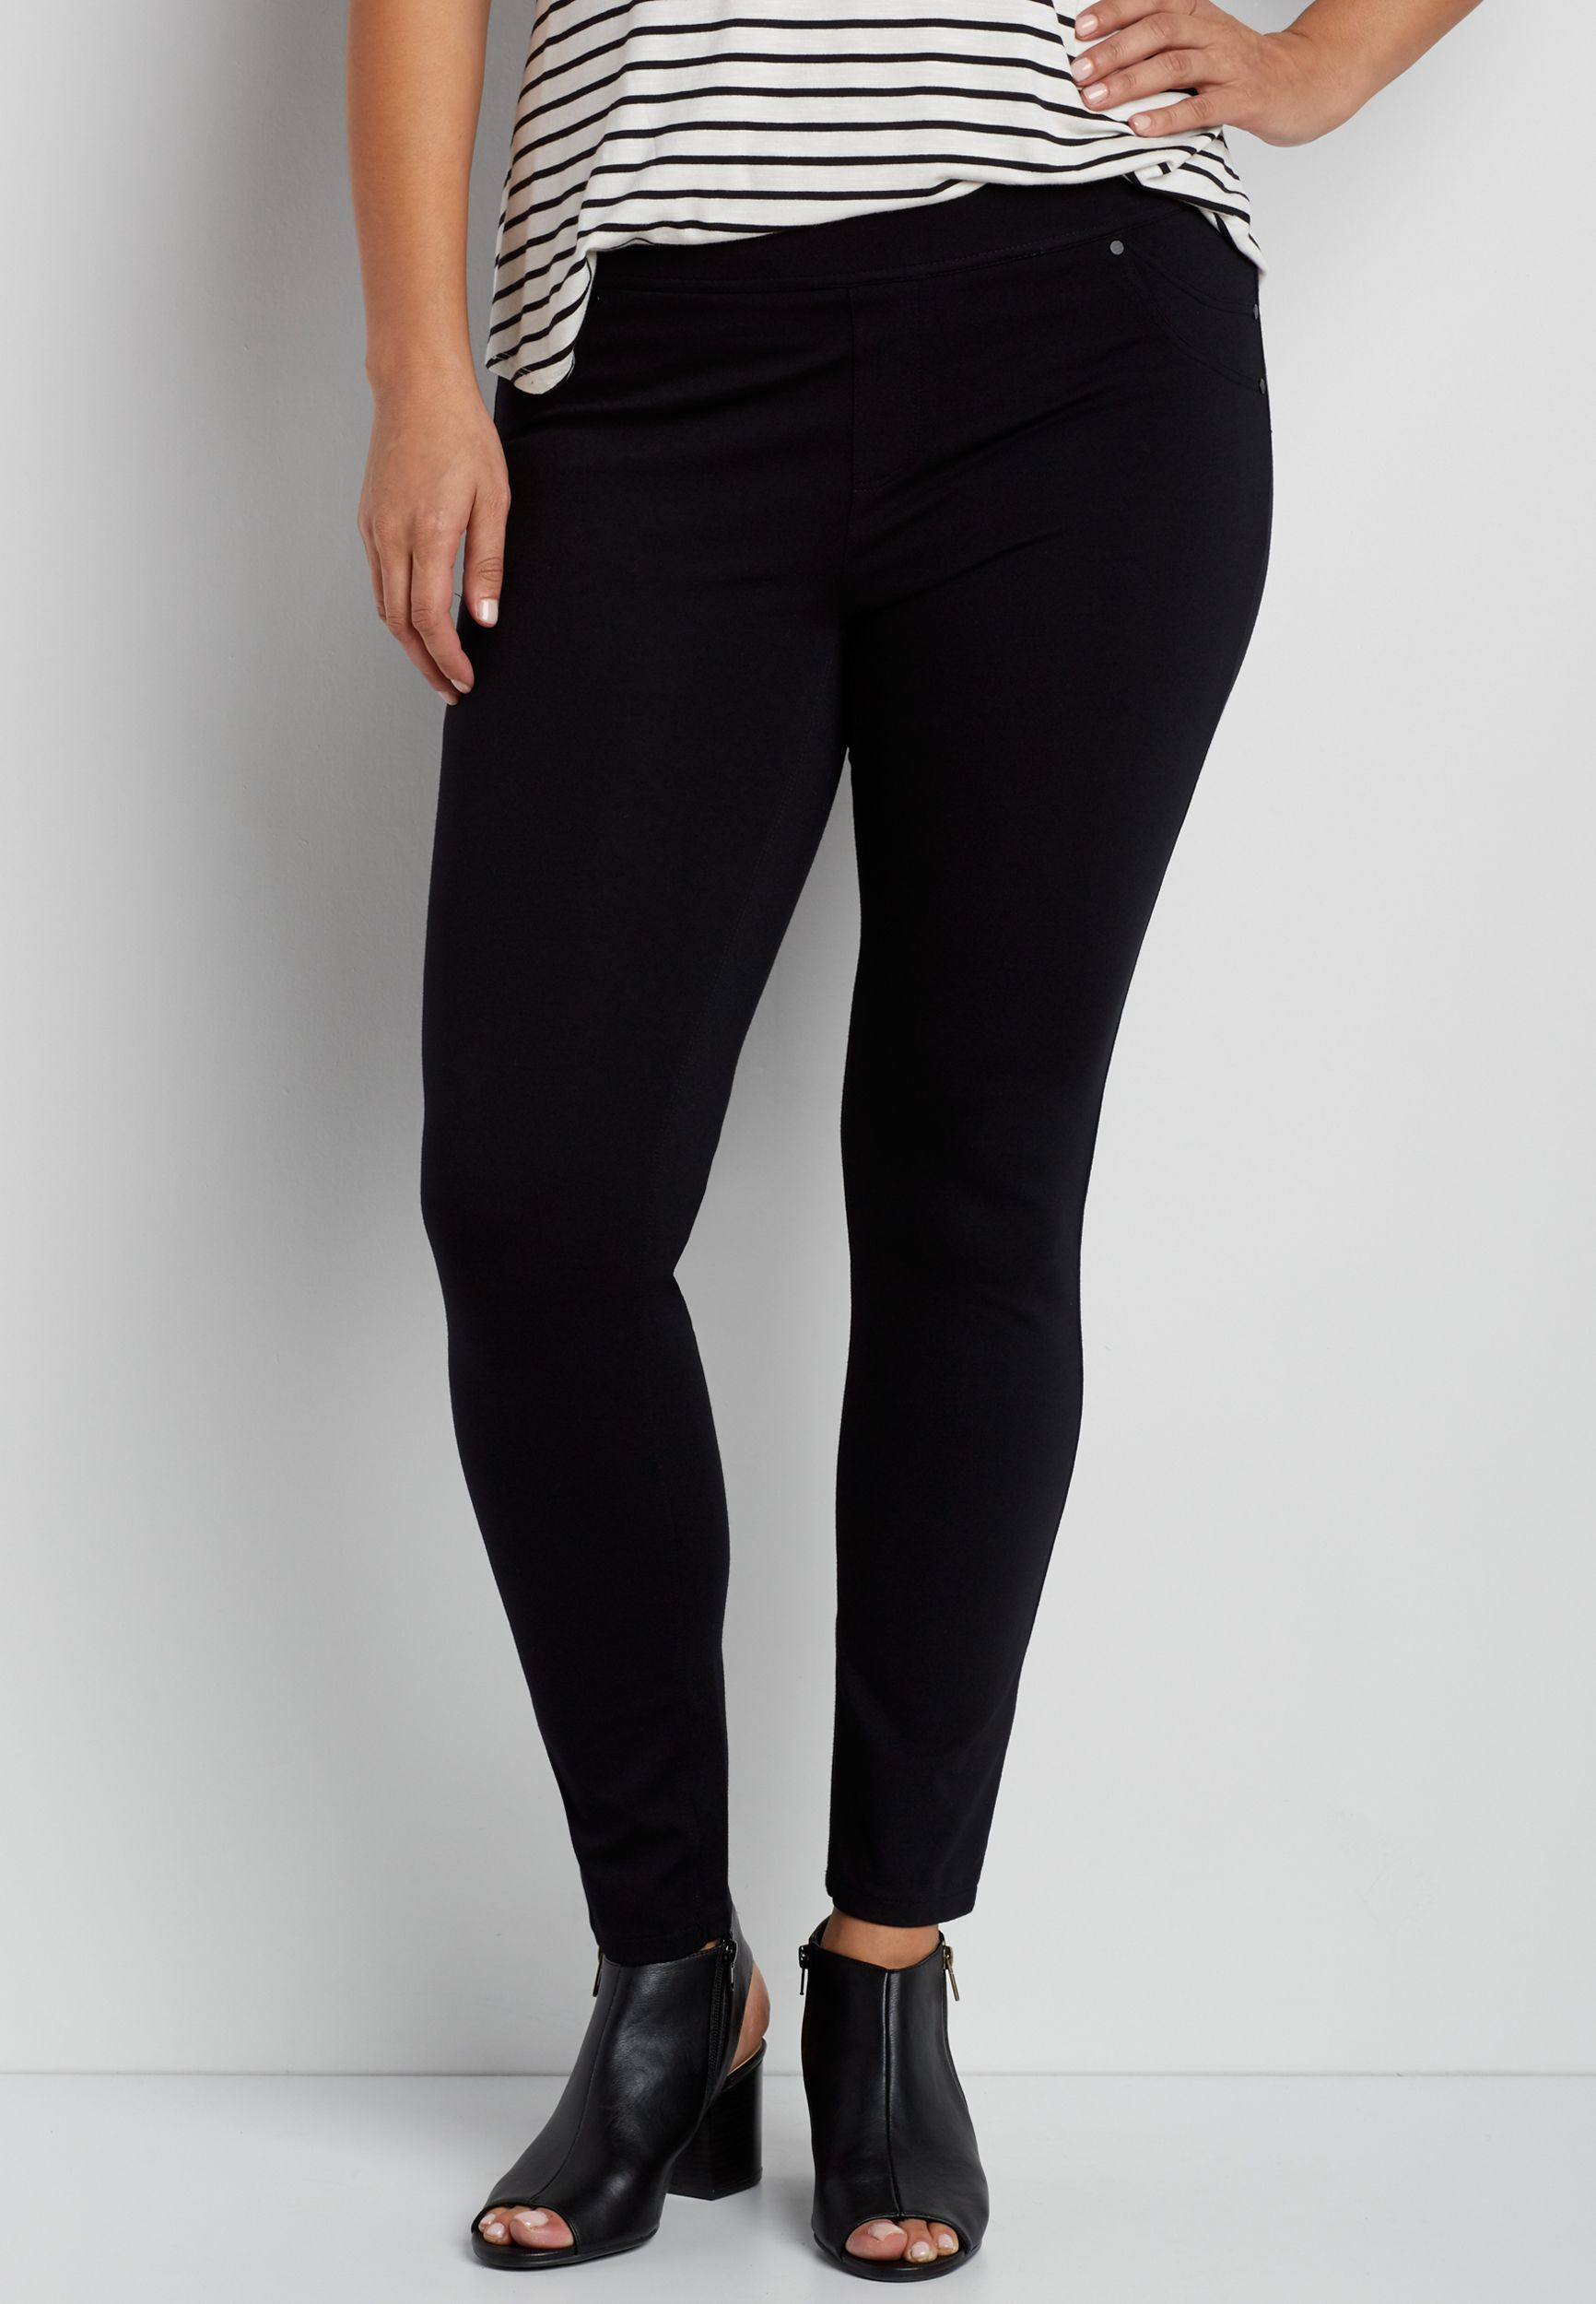 9cbcdff1604 the smart skinny plus size pull on ponte pant in black (original price